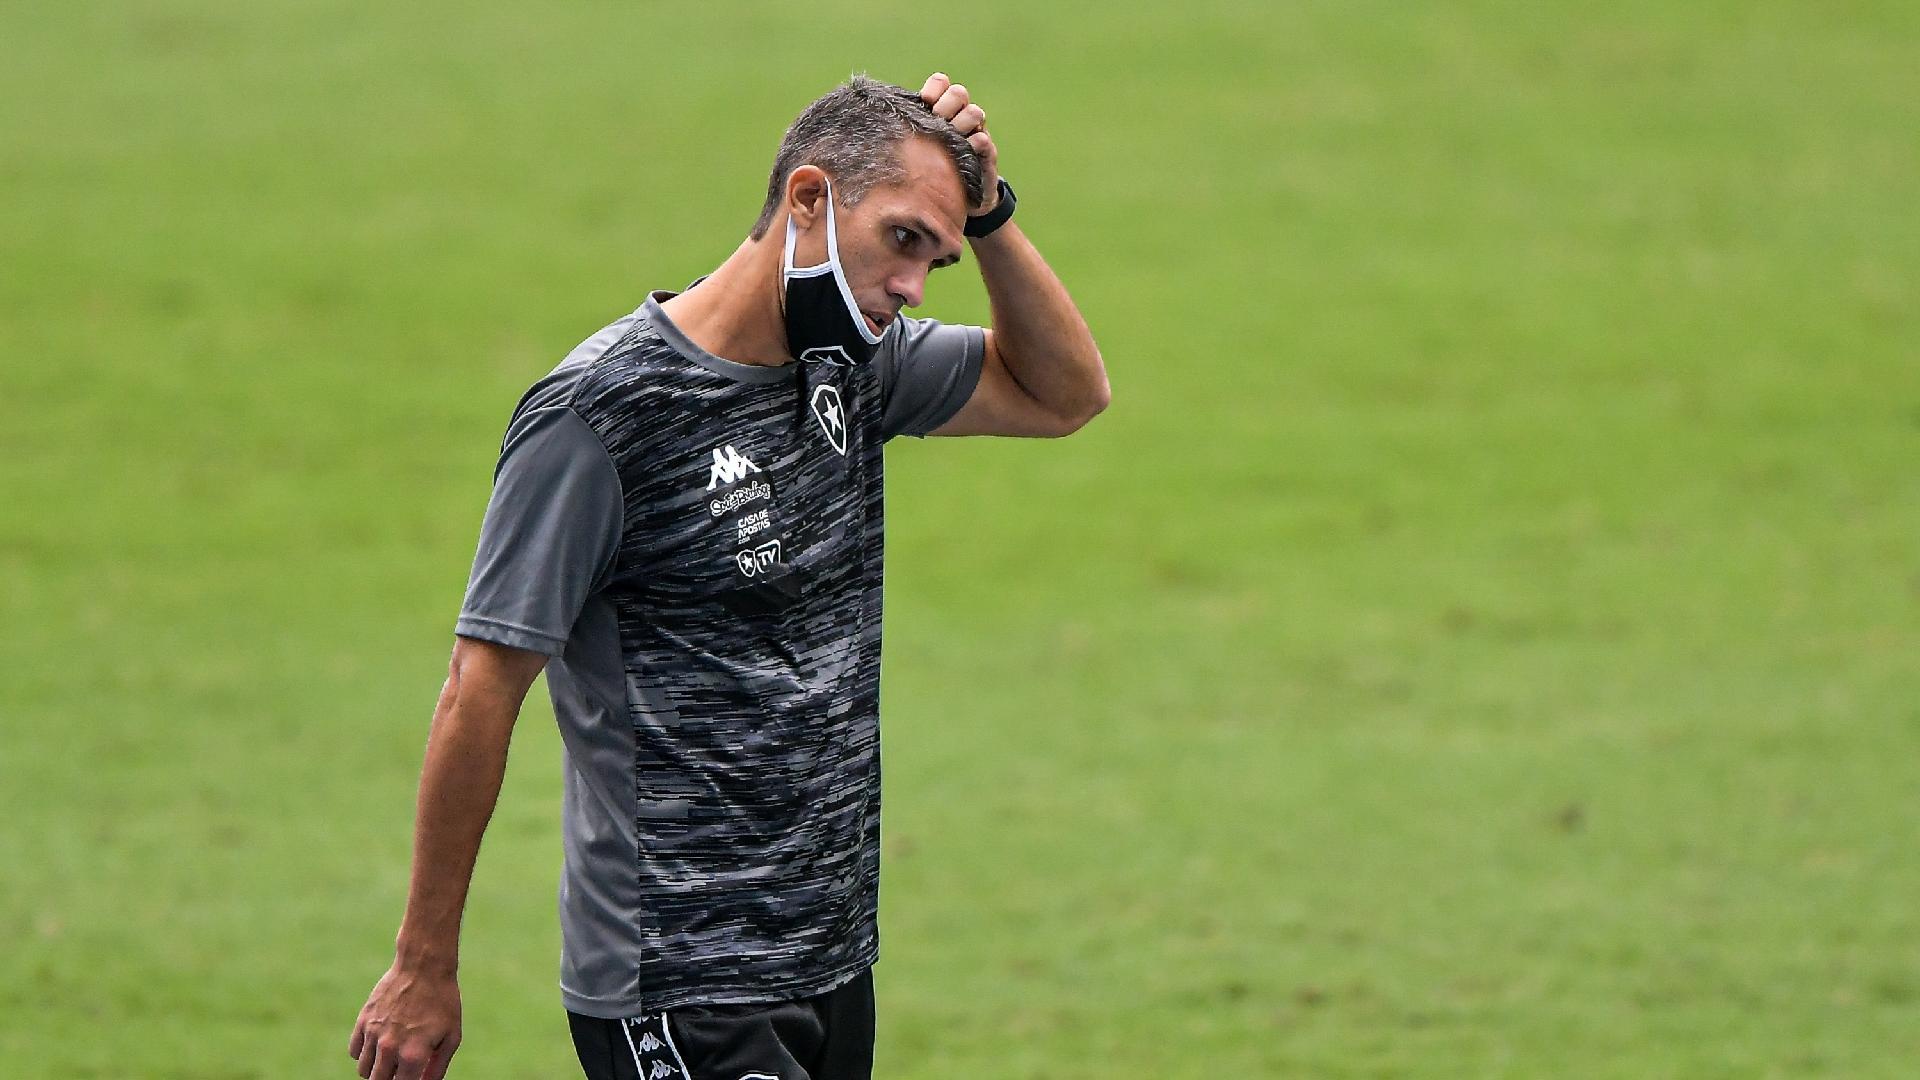 Bruno Lazaroni à beira do gramado do Estádio Nilton Santos